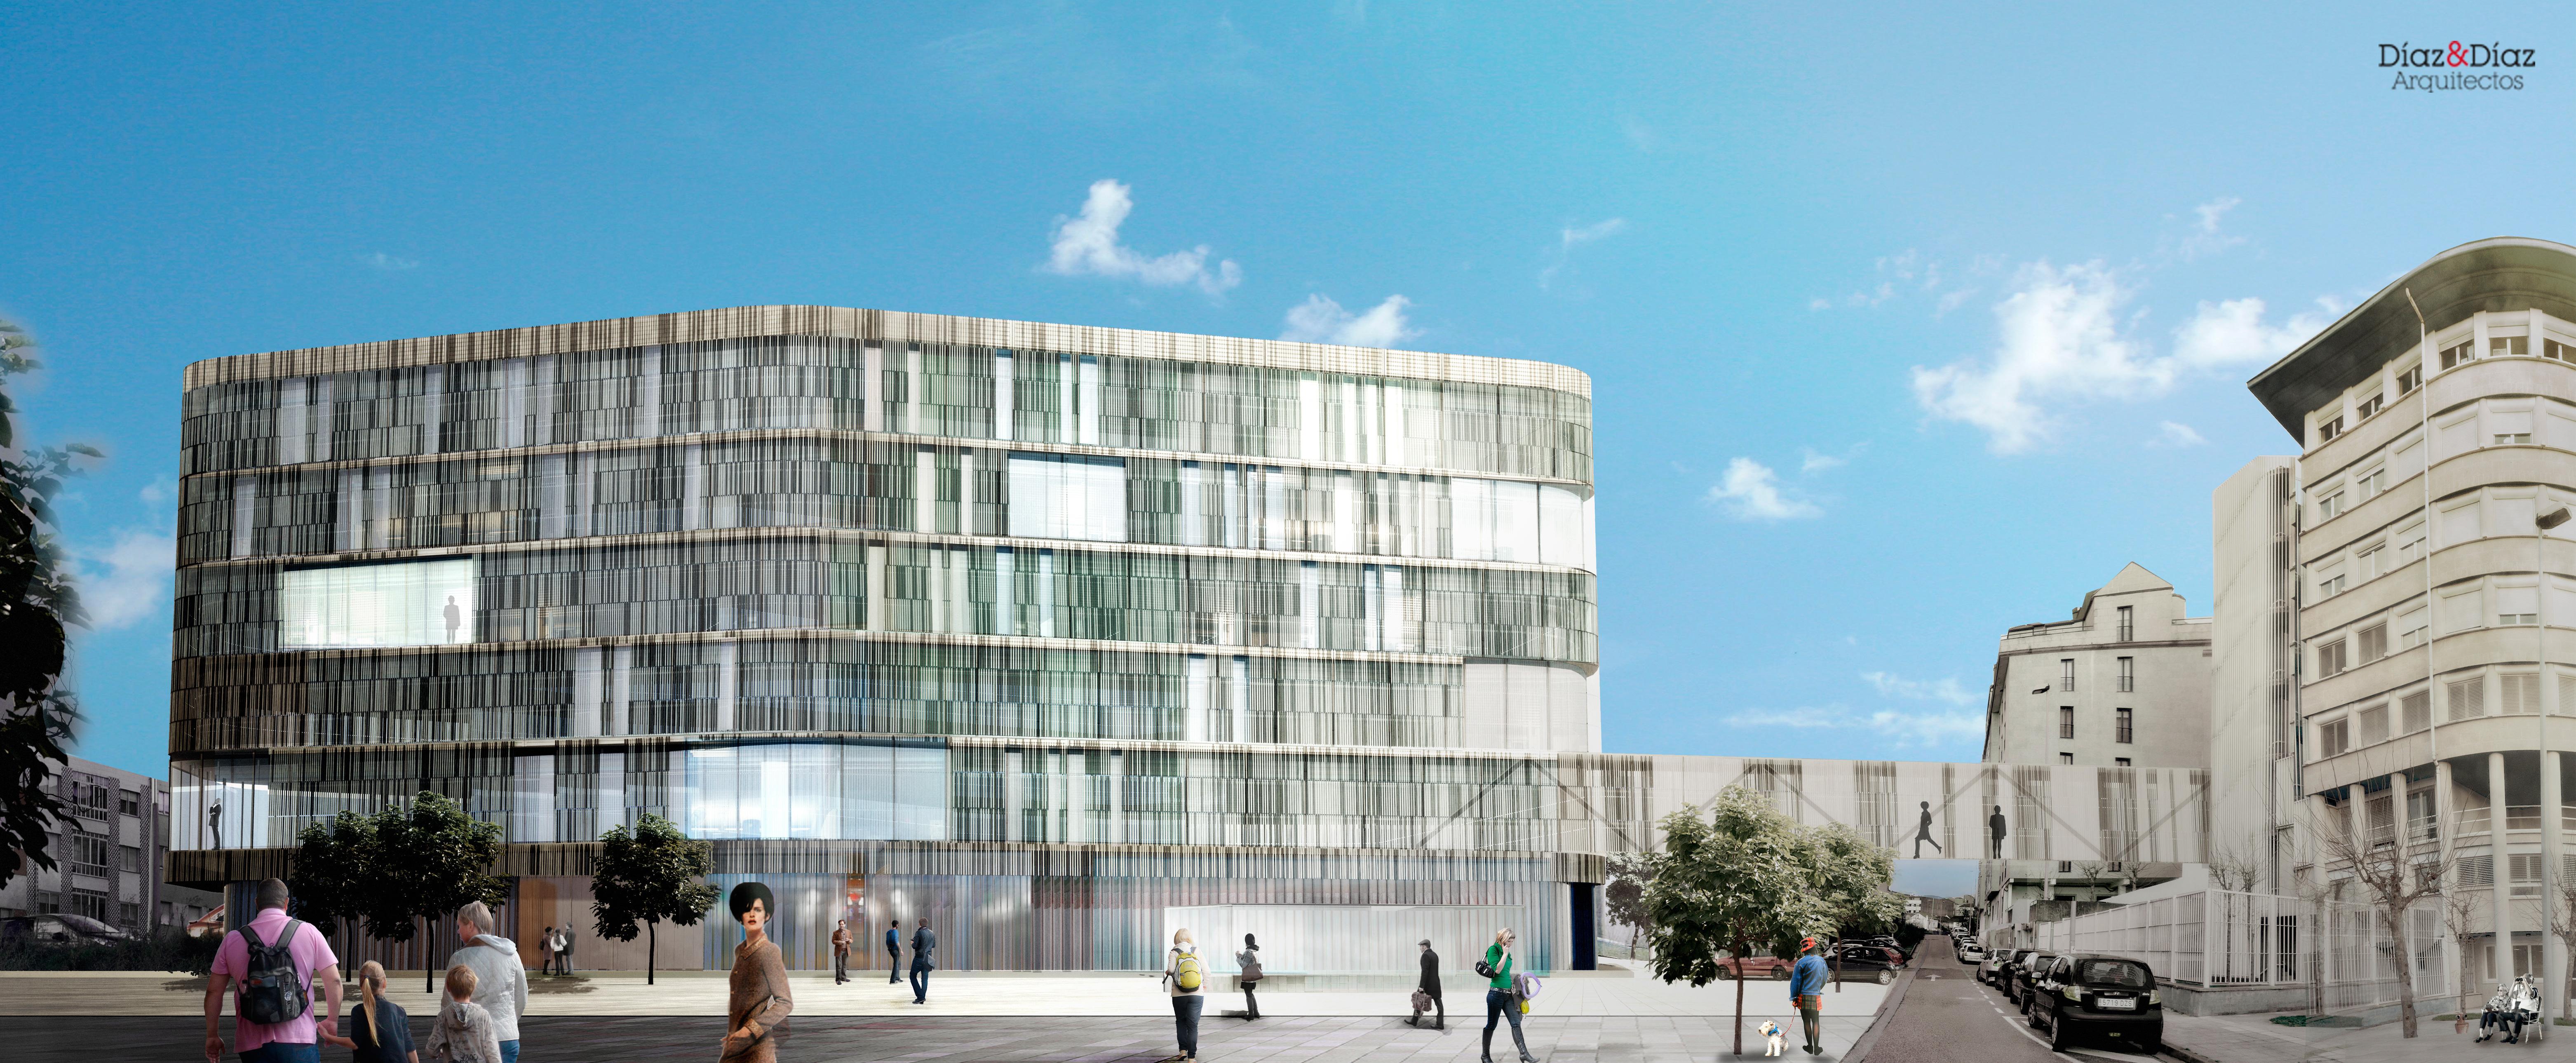 Nuevo edificio judicial d az d az arquitectos a - Arquitectos en pontevedra ...